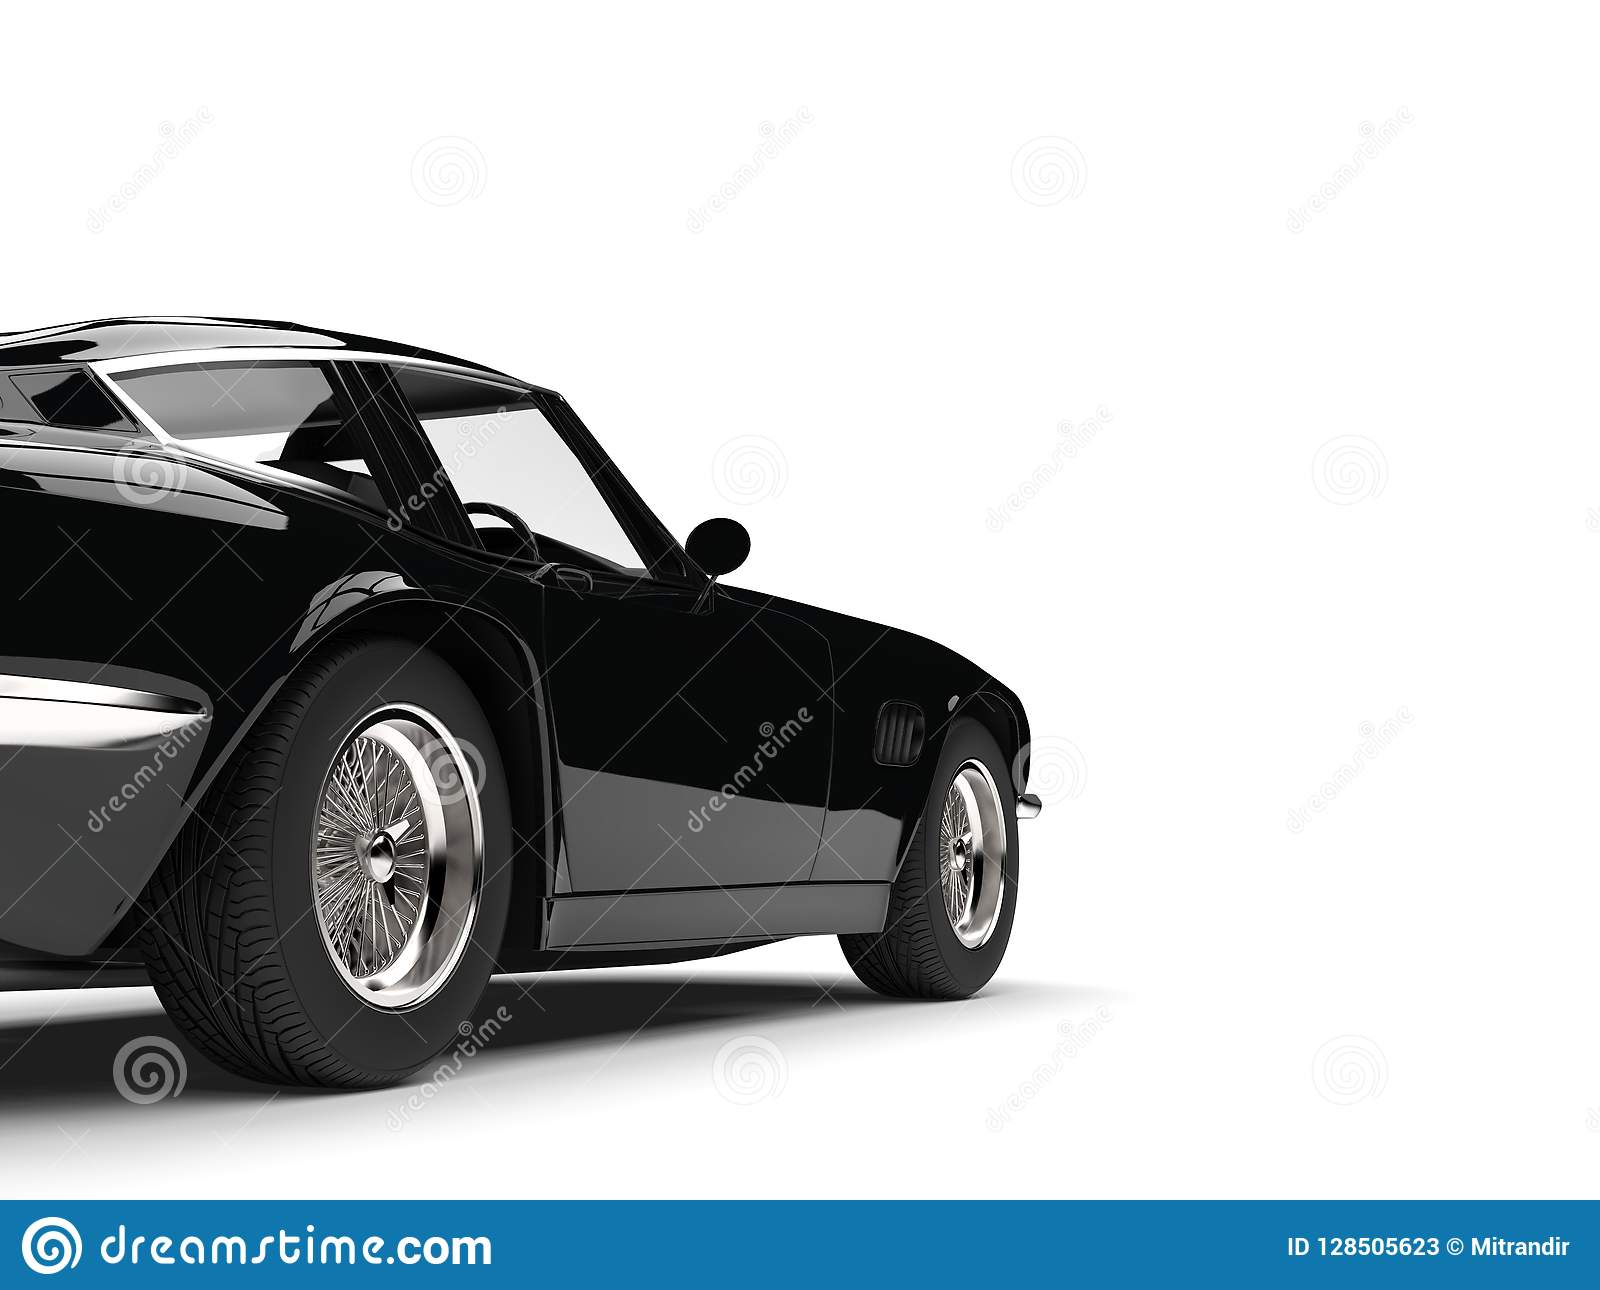 Eerie black vintage race car - rear wheel closeup shot